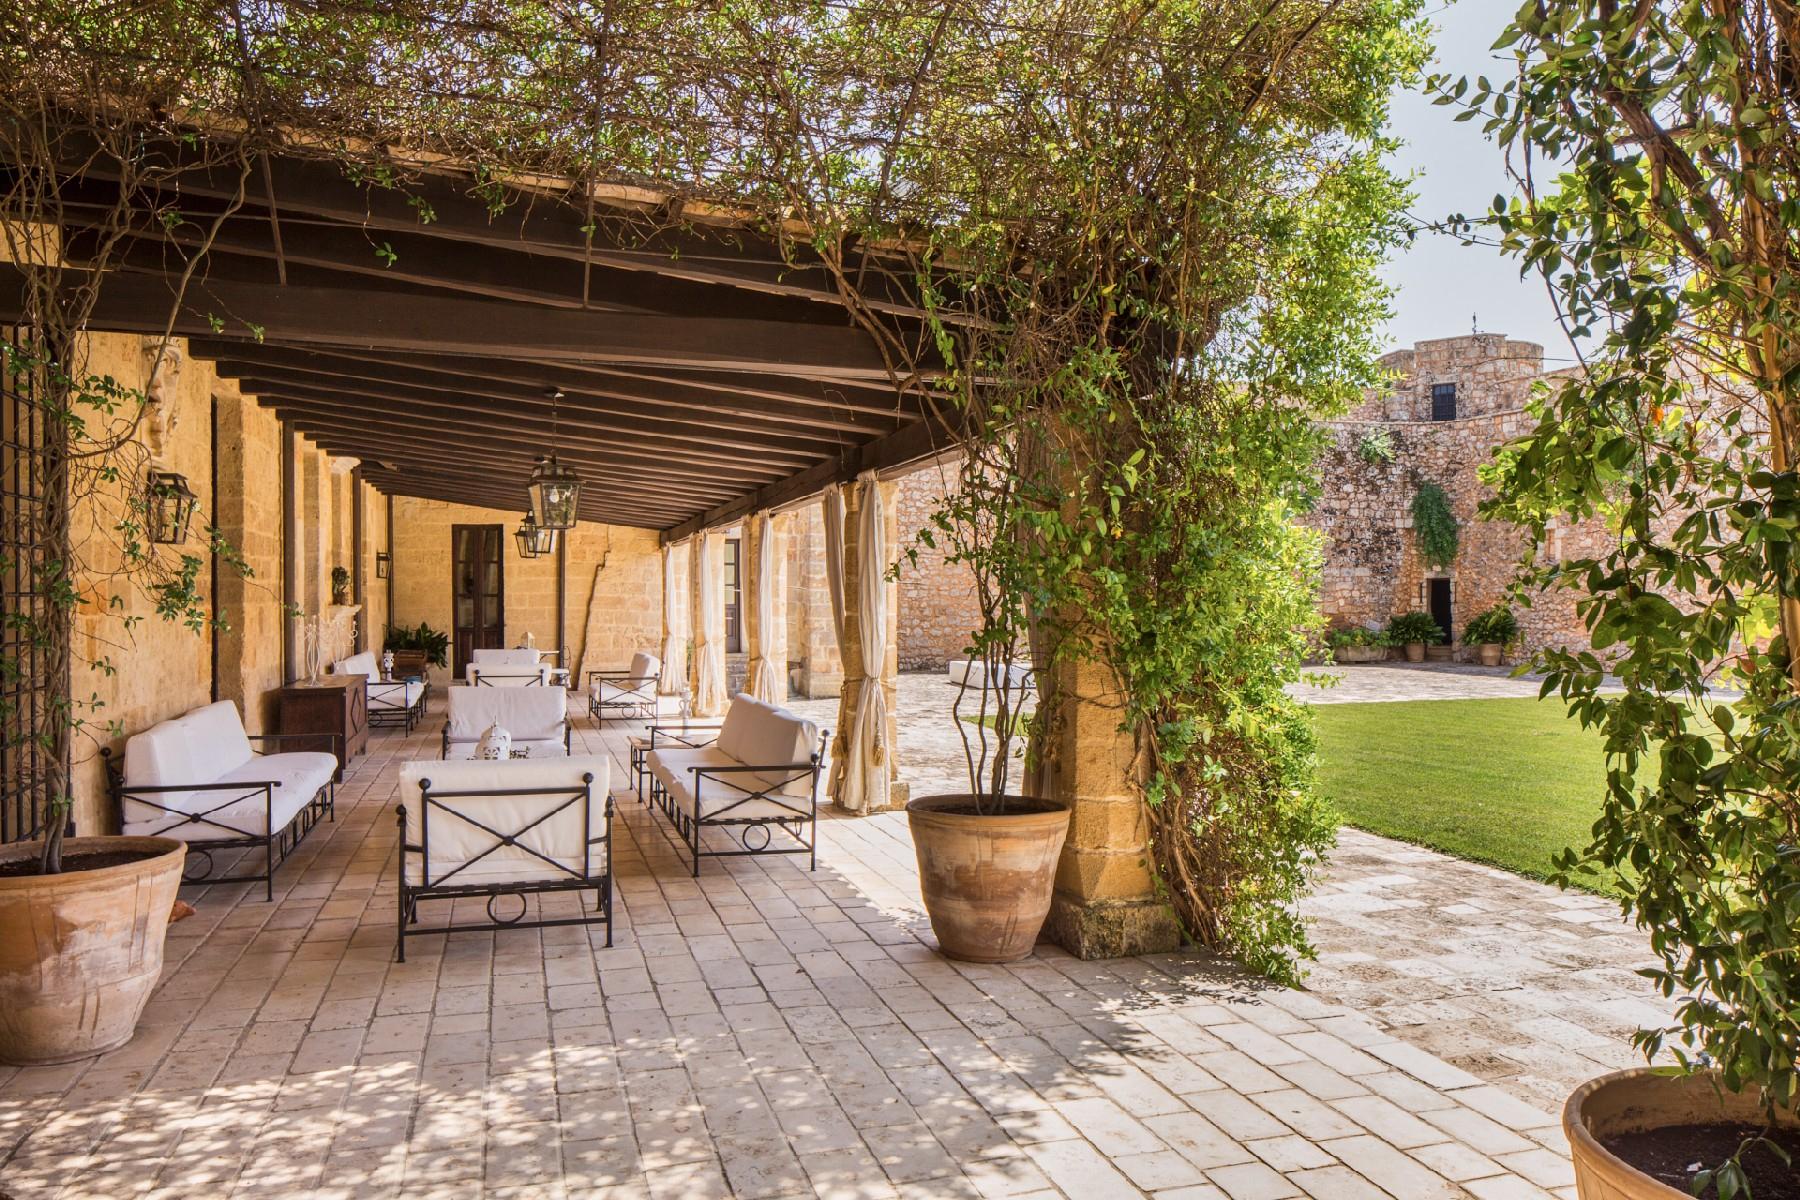 Villa in Vendita a Tricase: 5 locali, 1700 mq - Foto 4